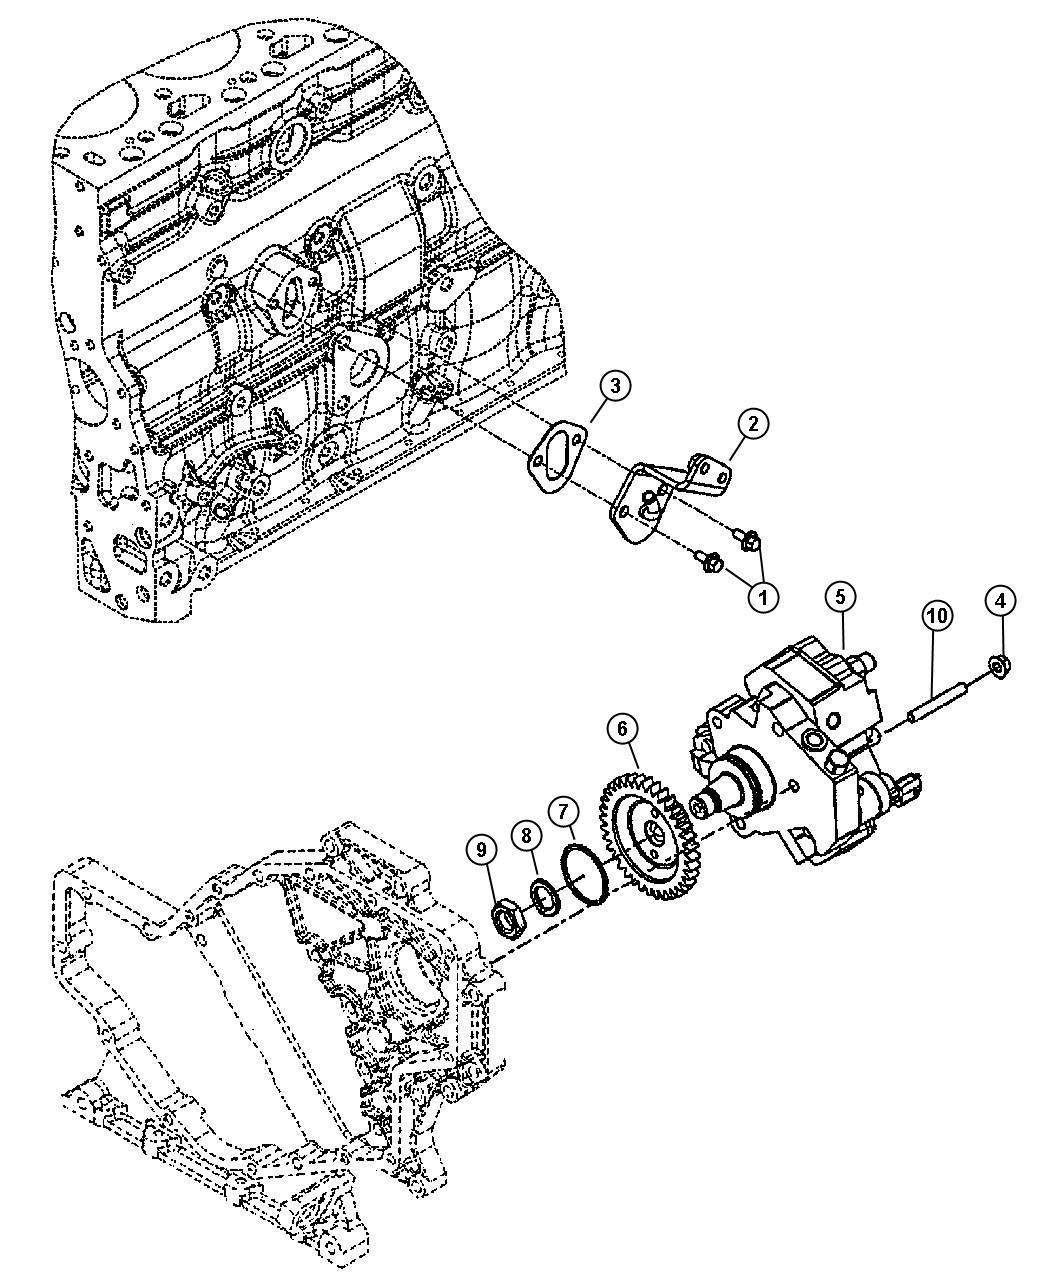 Dodge Cummins Serpentine Belt Diagram Pictures To Pin